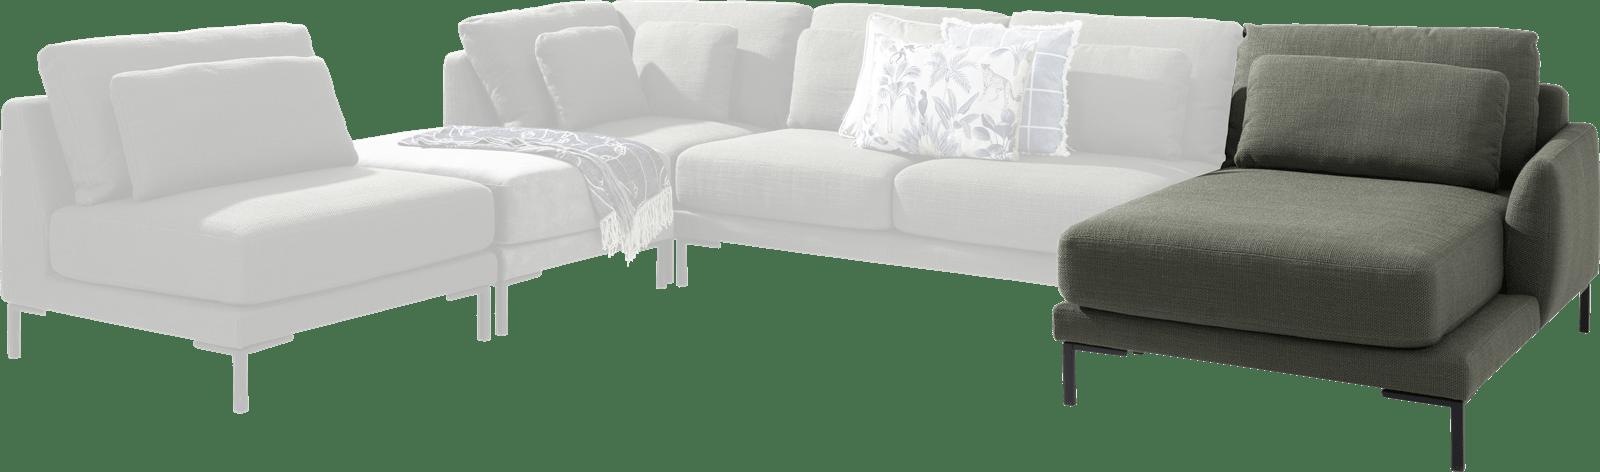 XOOON - Toledos - Design minimaliste - Toutes les canapés - meridienne droite